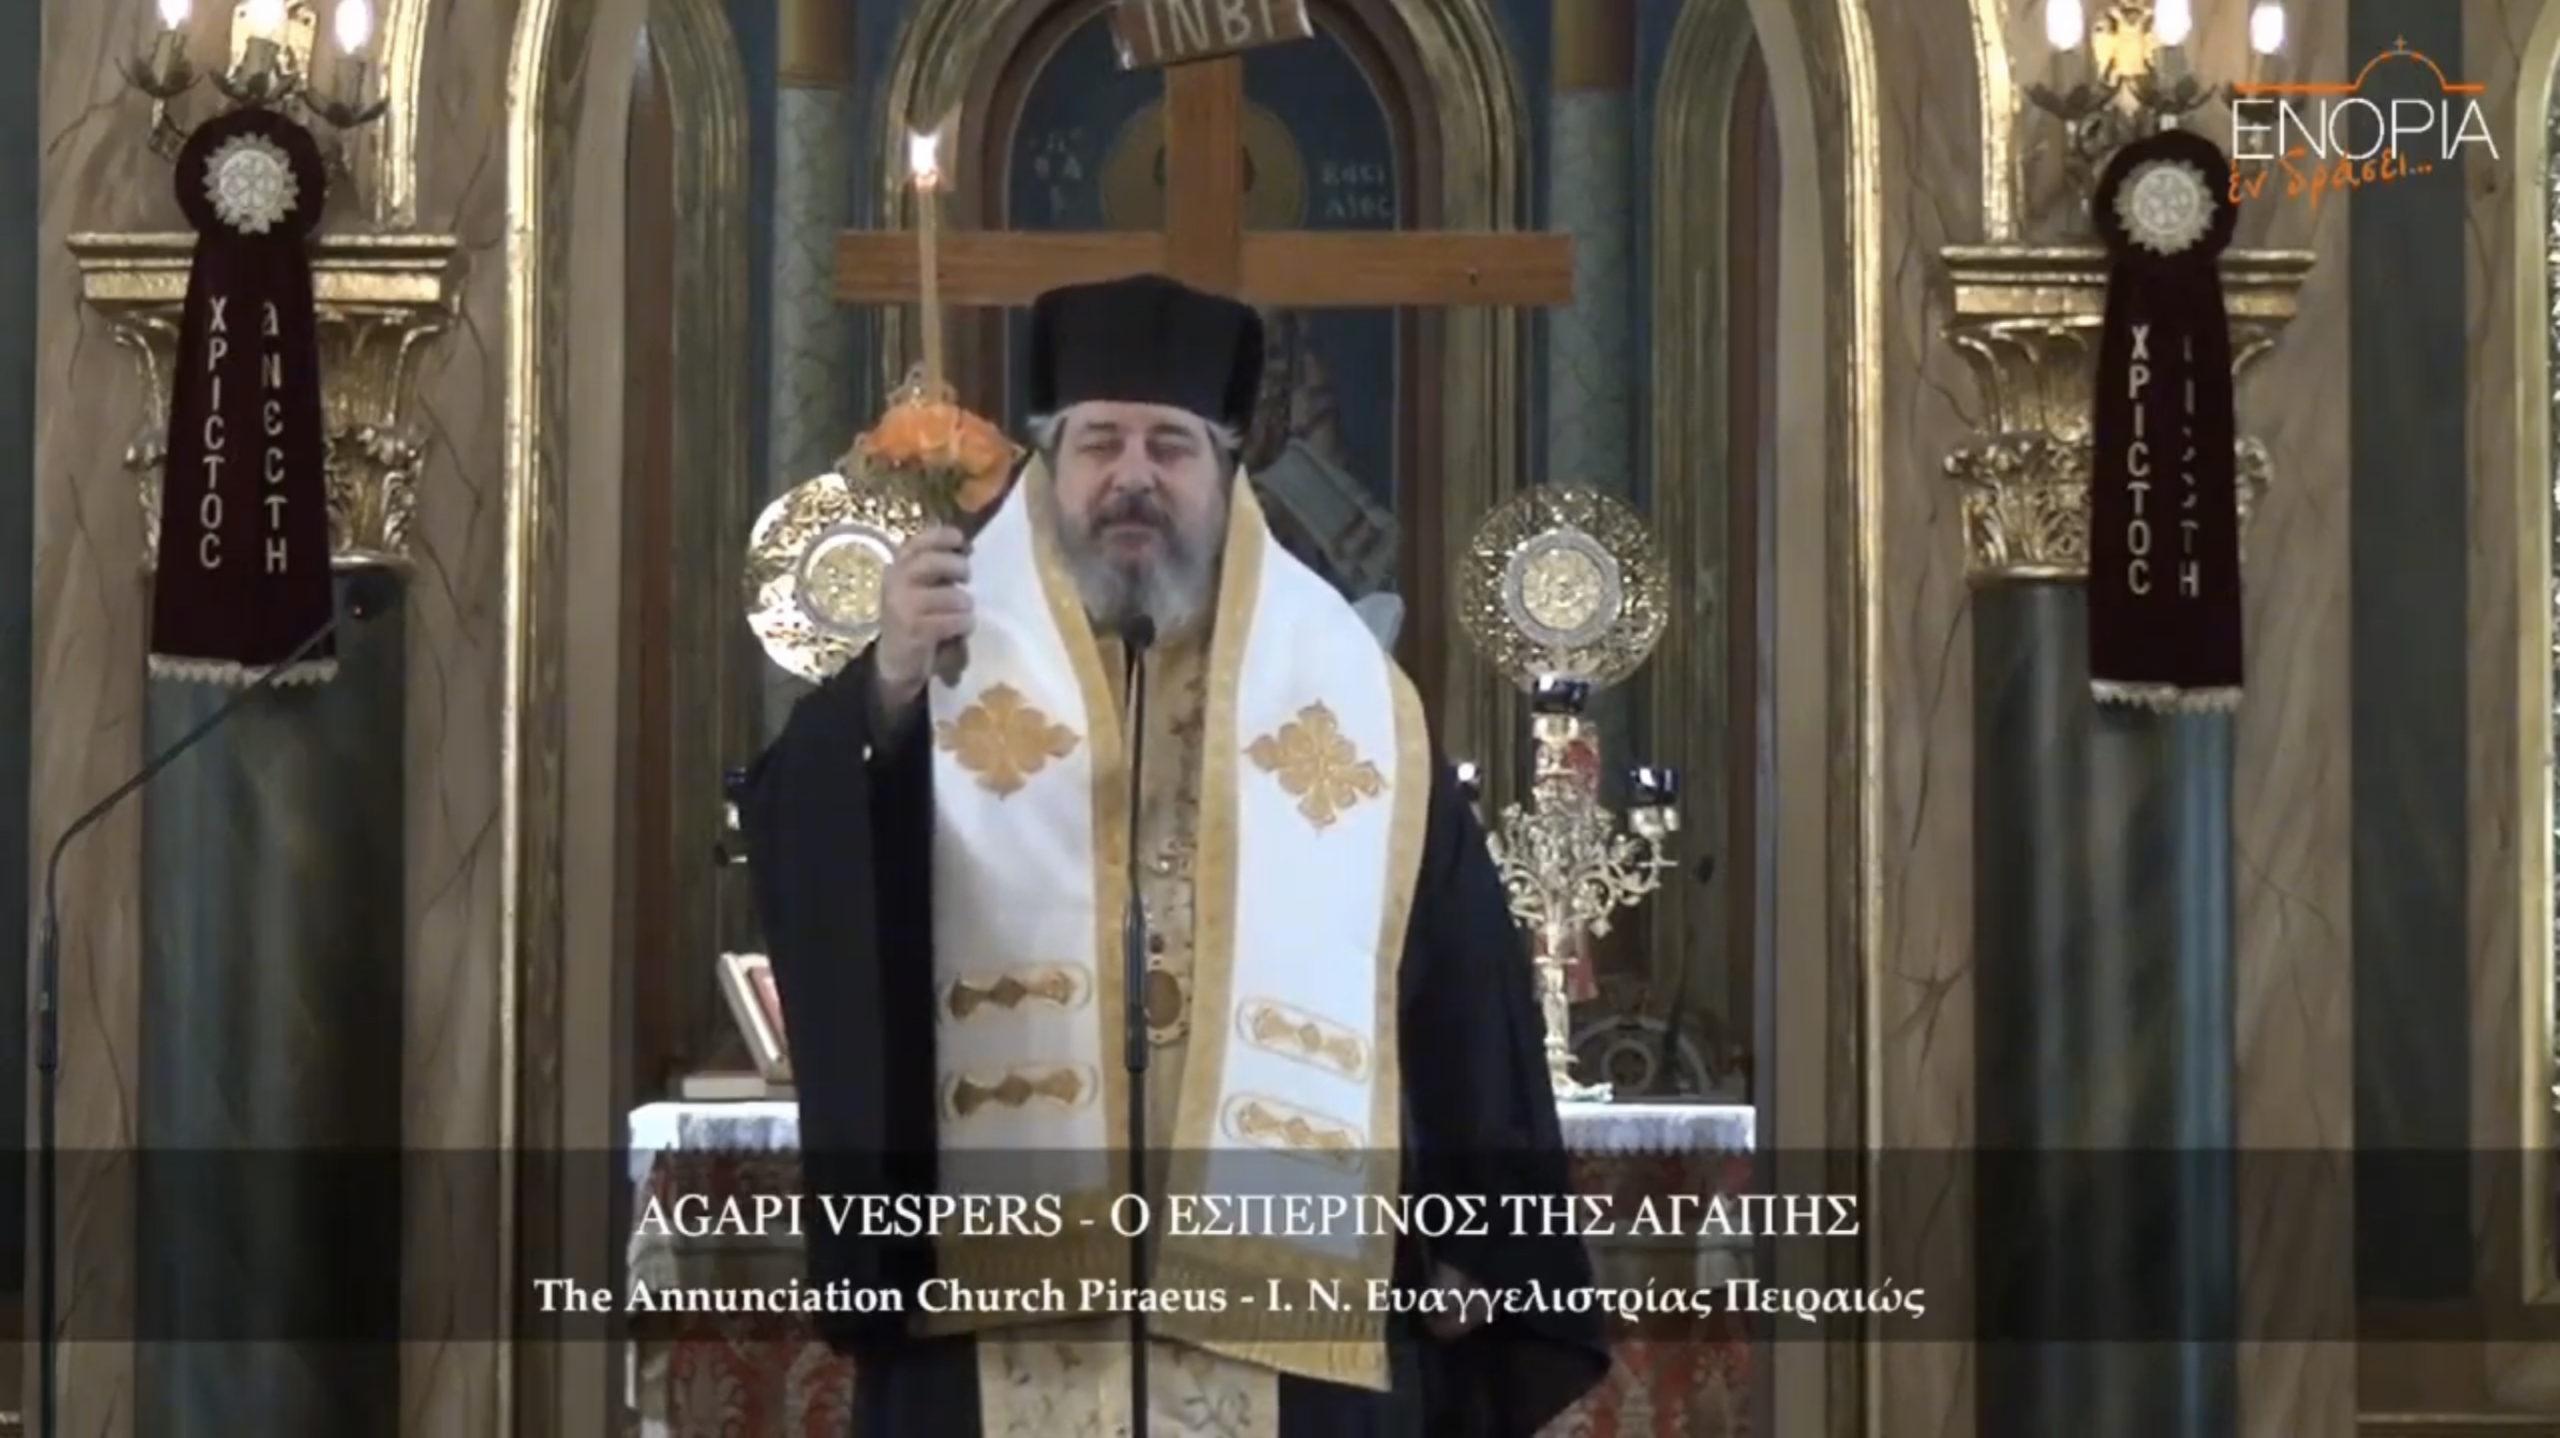 Agape Vespers-Message by Metropolitan Nektarios